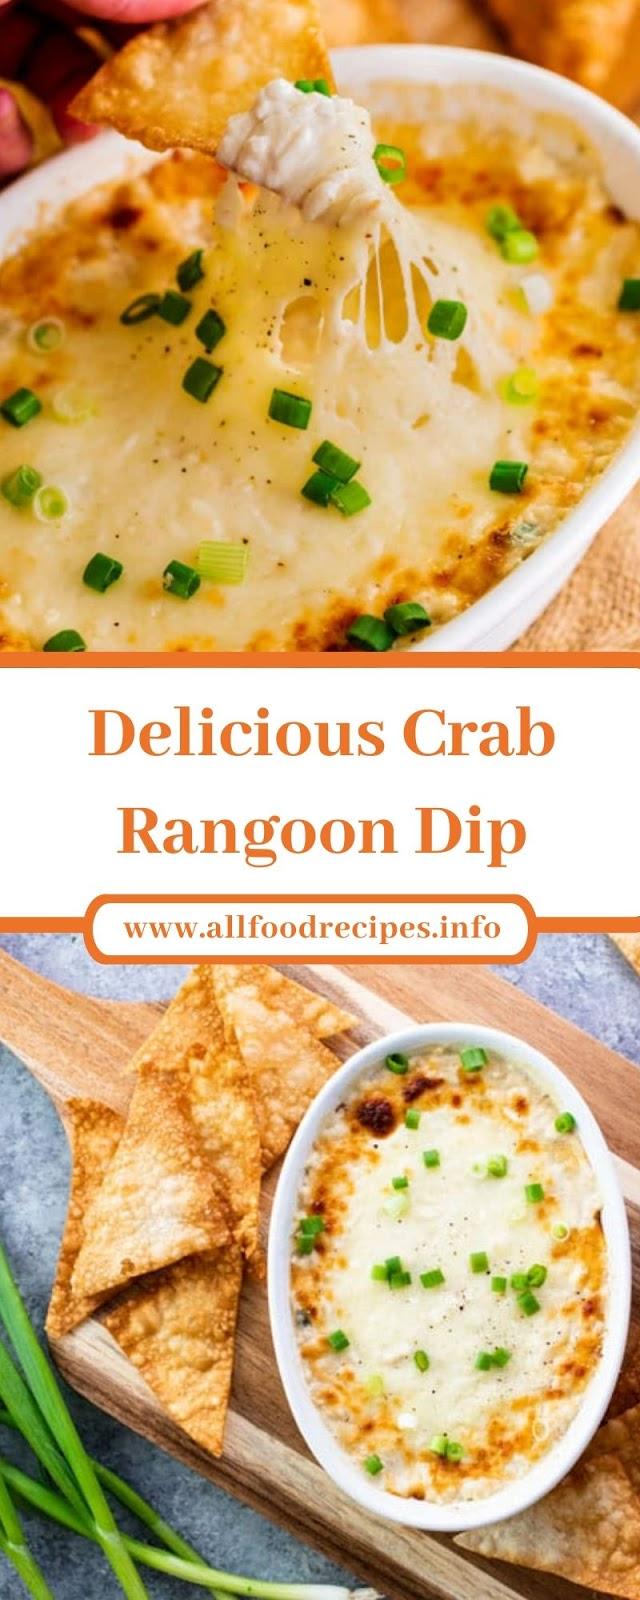 Delicious Crab Rangoon Dip